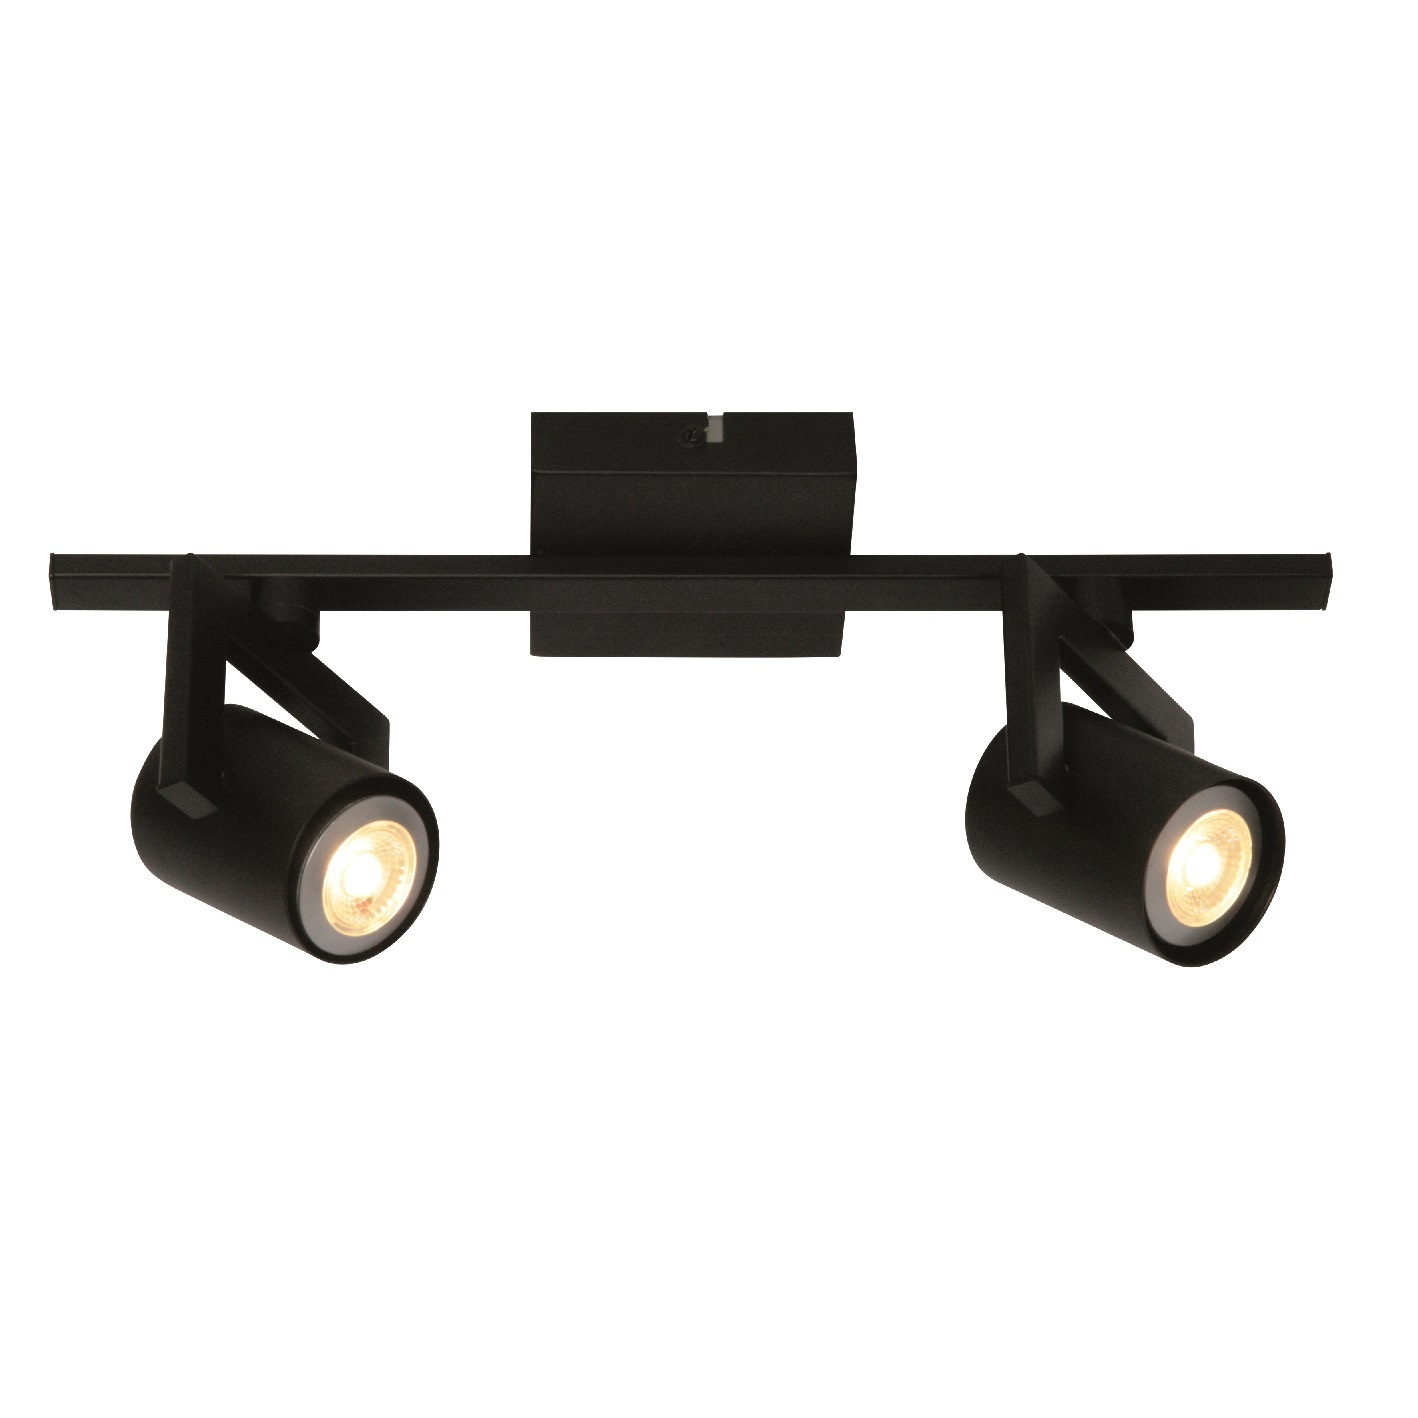 Spot Valvoled LED Zwart 2 Lichts |  | 8718444955337